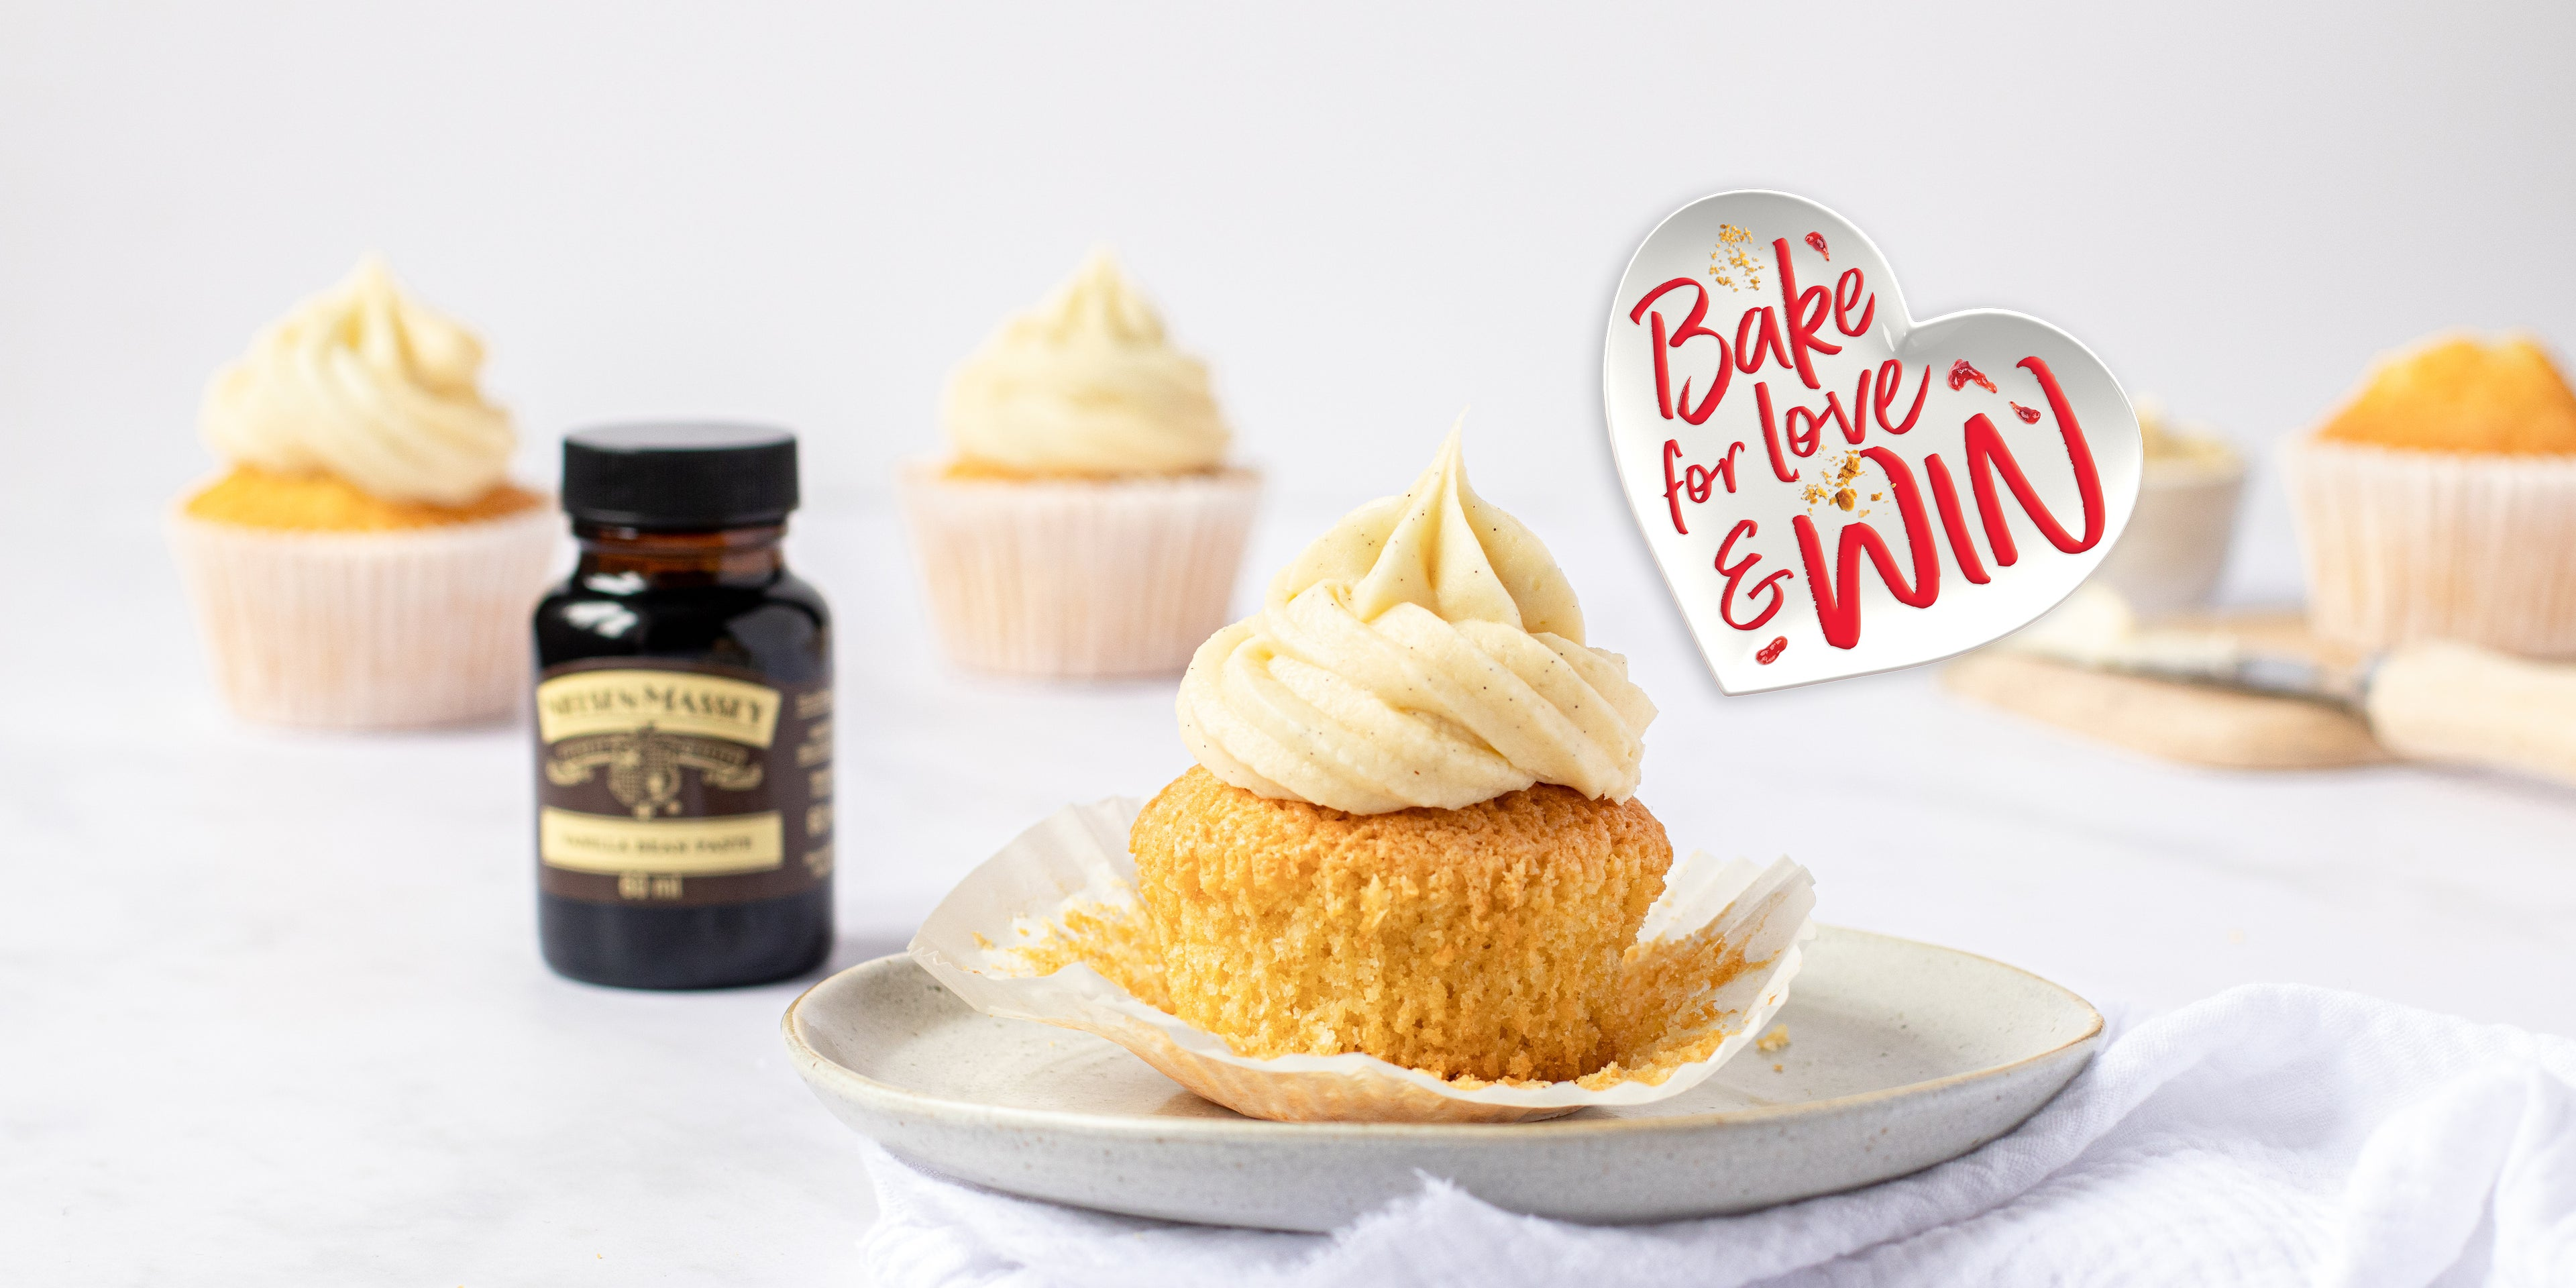 Close up shot of a vanilla cupcake next to a small jar of Neilsen Massey's vanilla extract